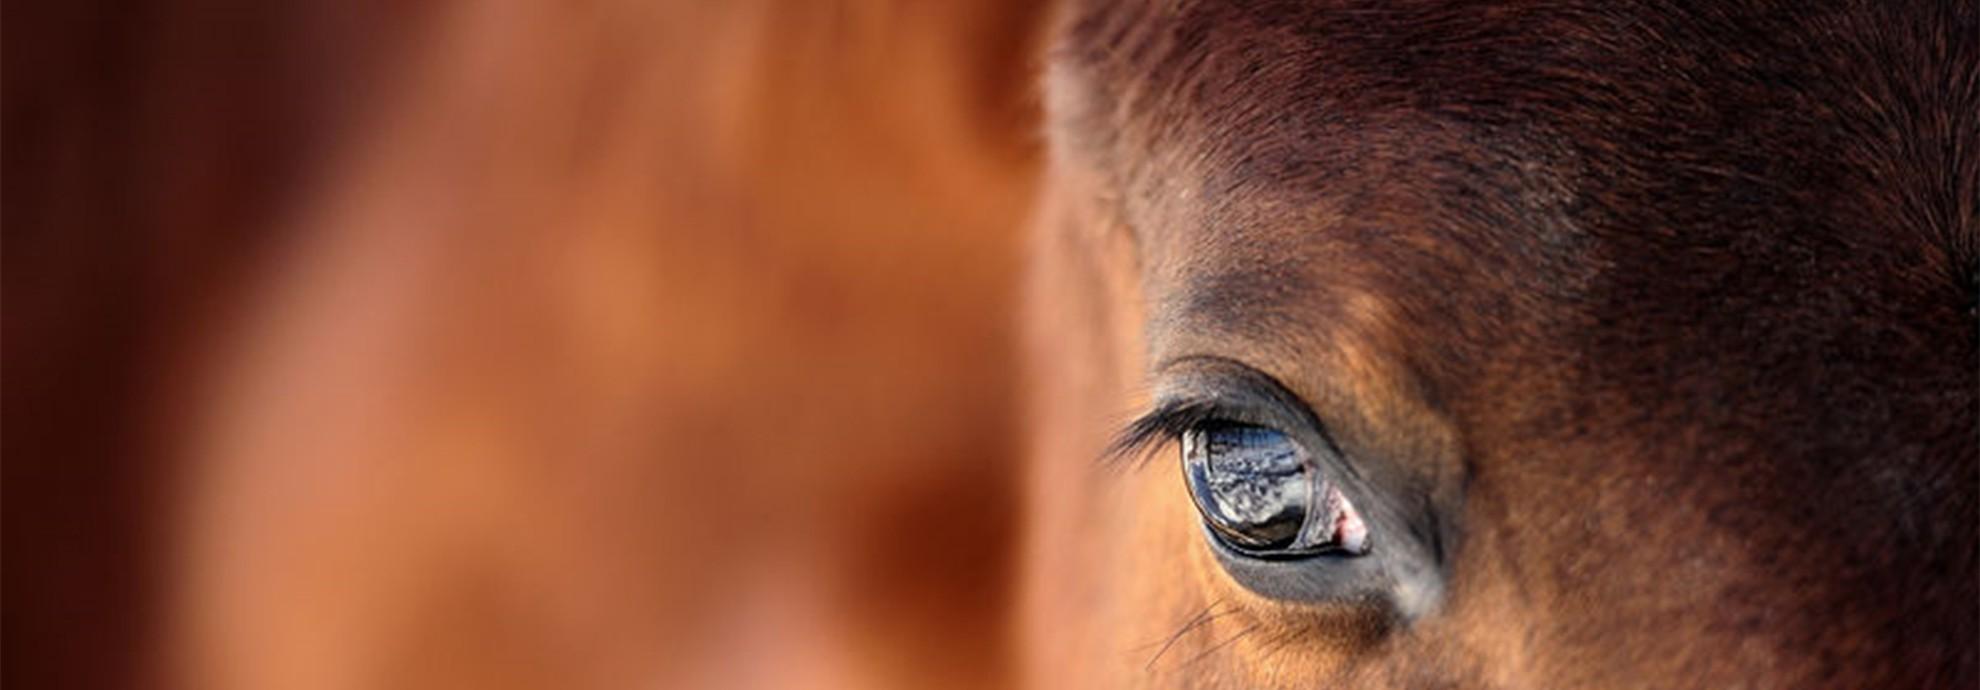 El mundo del caballo